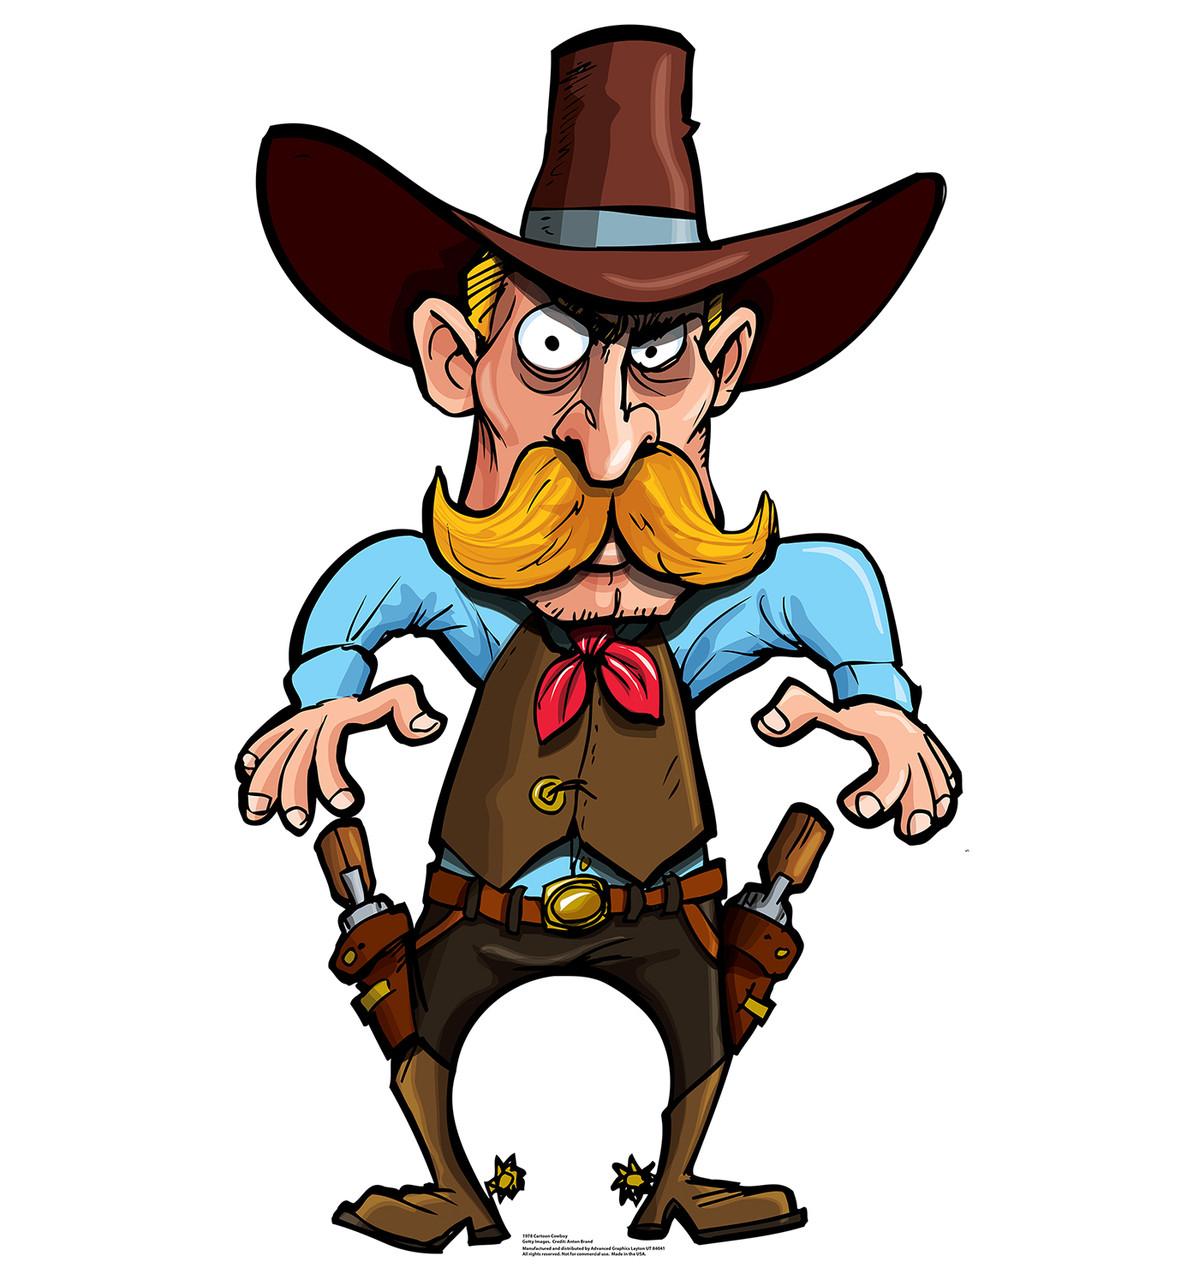 Life-size Cartoon Cowboy Cardboard Standup